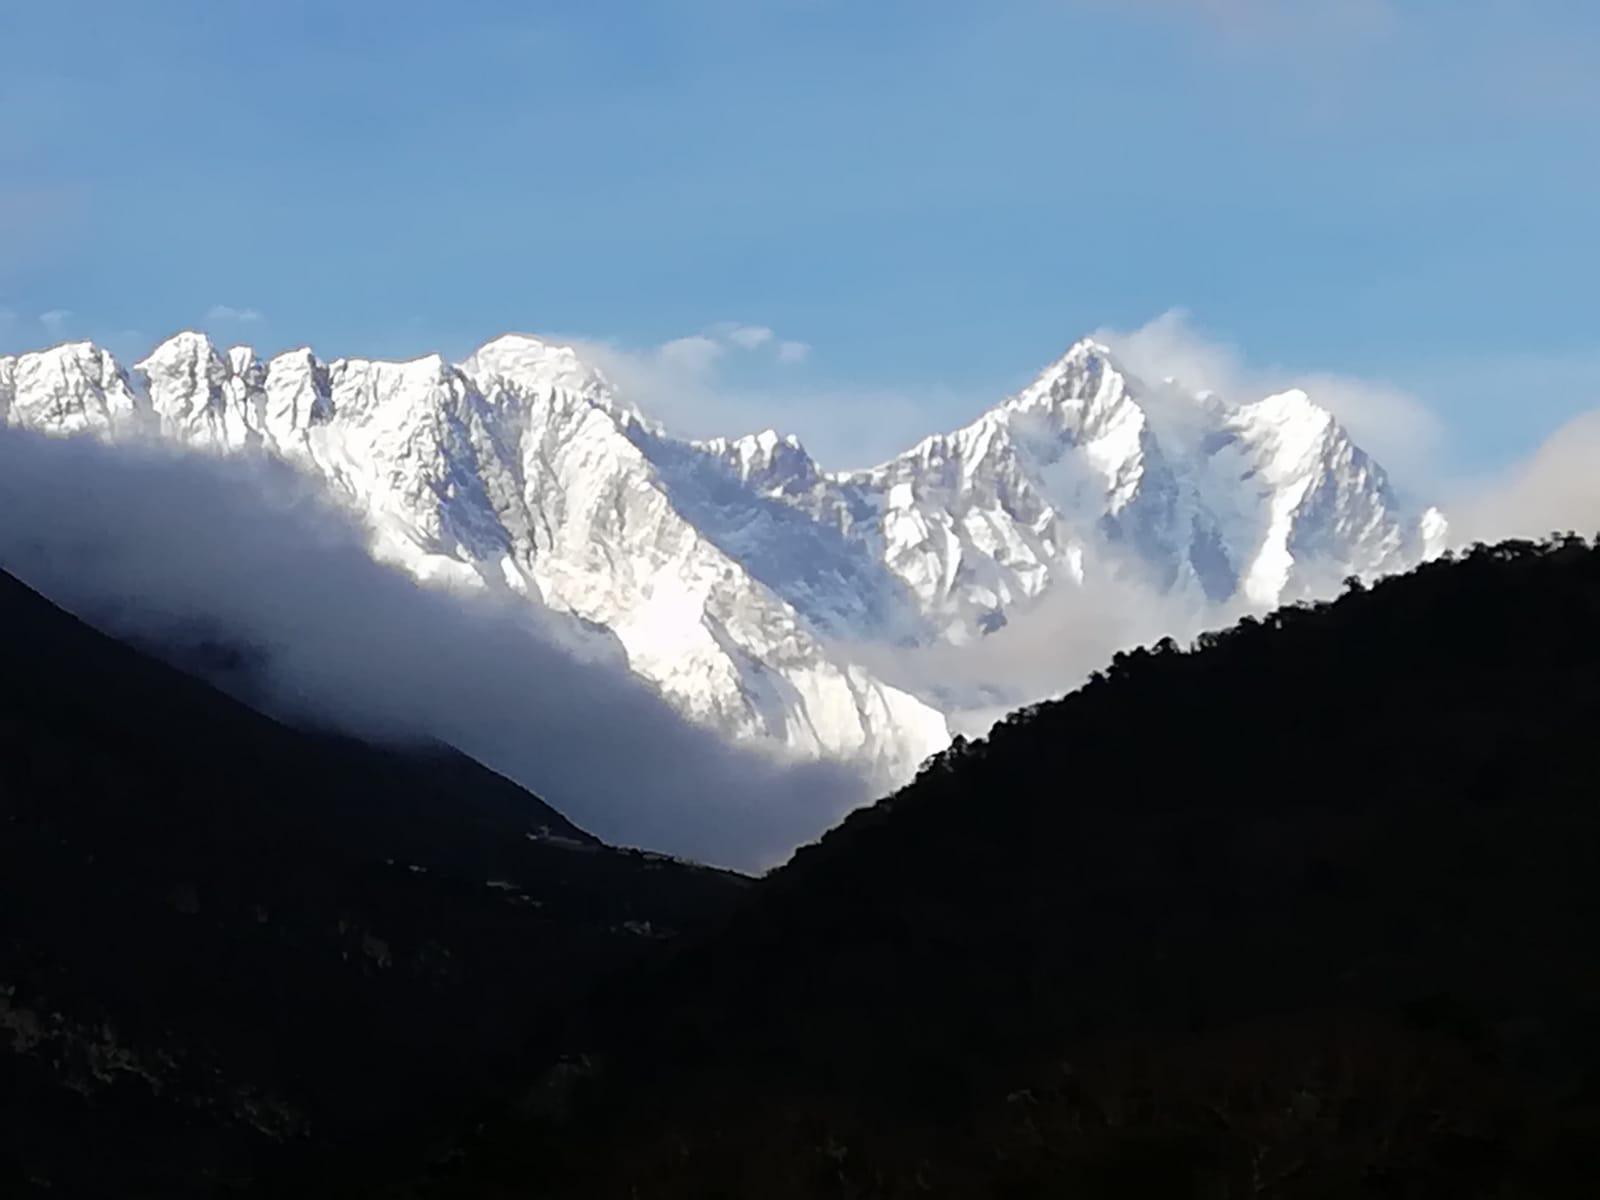 Samedi 7 avril: anniversaire de mon Sherpa 27 ans!!